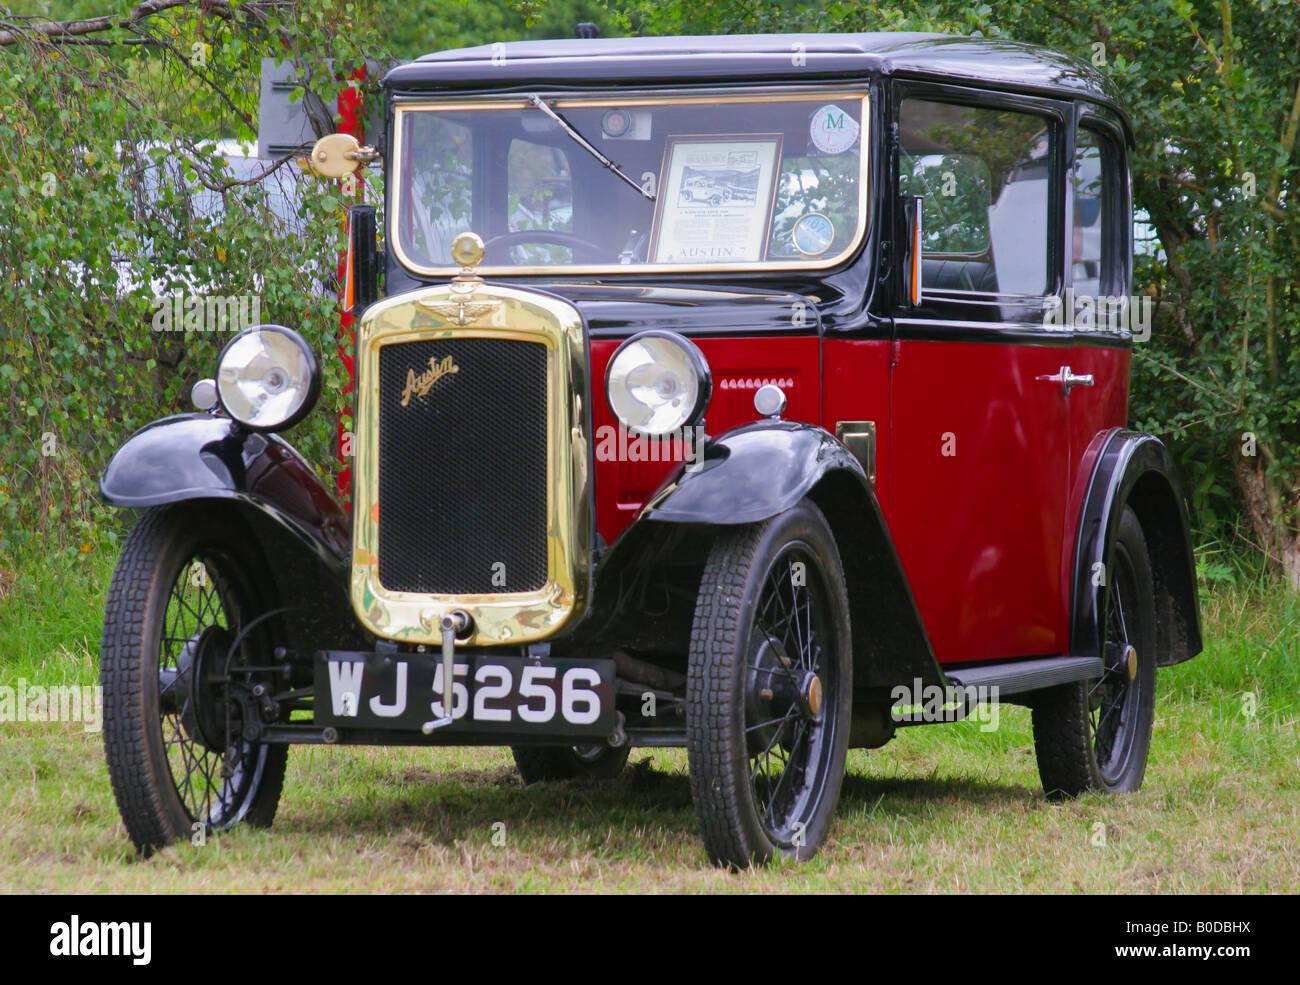 Vintage British Austin 7 car on display at Dolgellau Countryside Fair - Stock Image